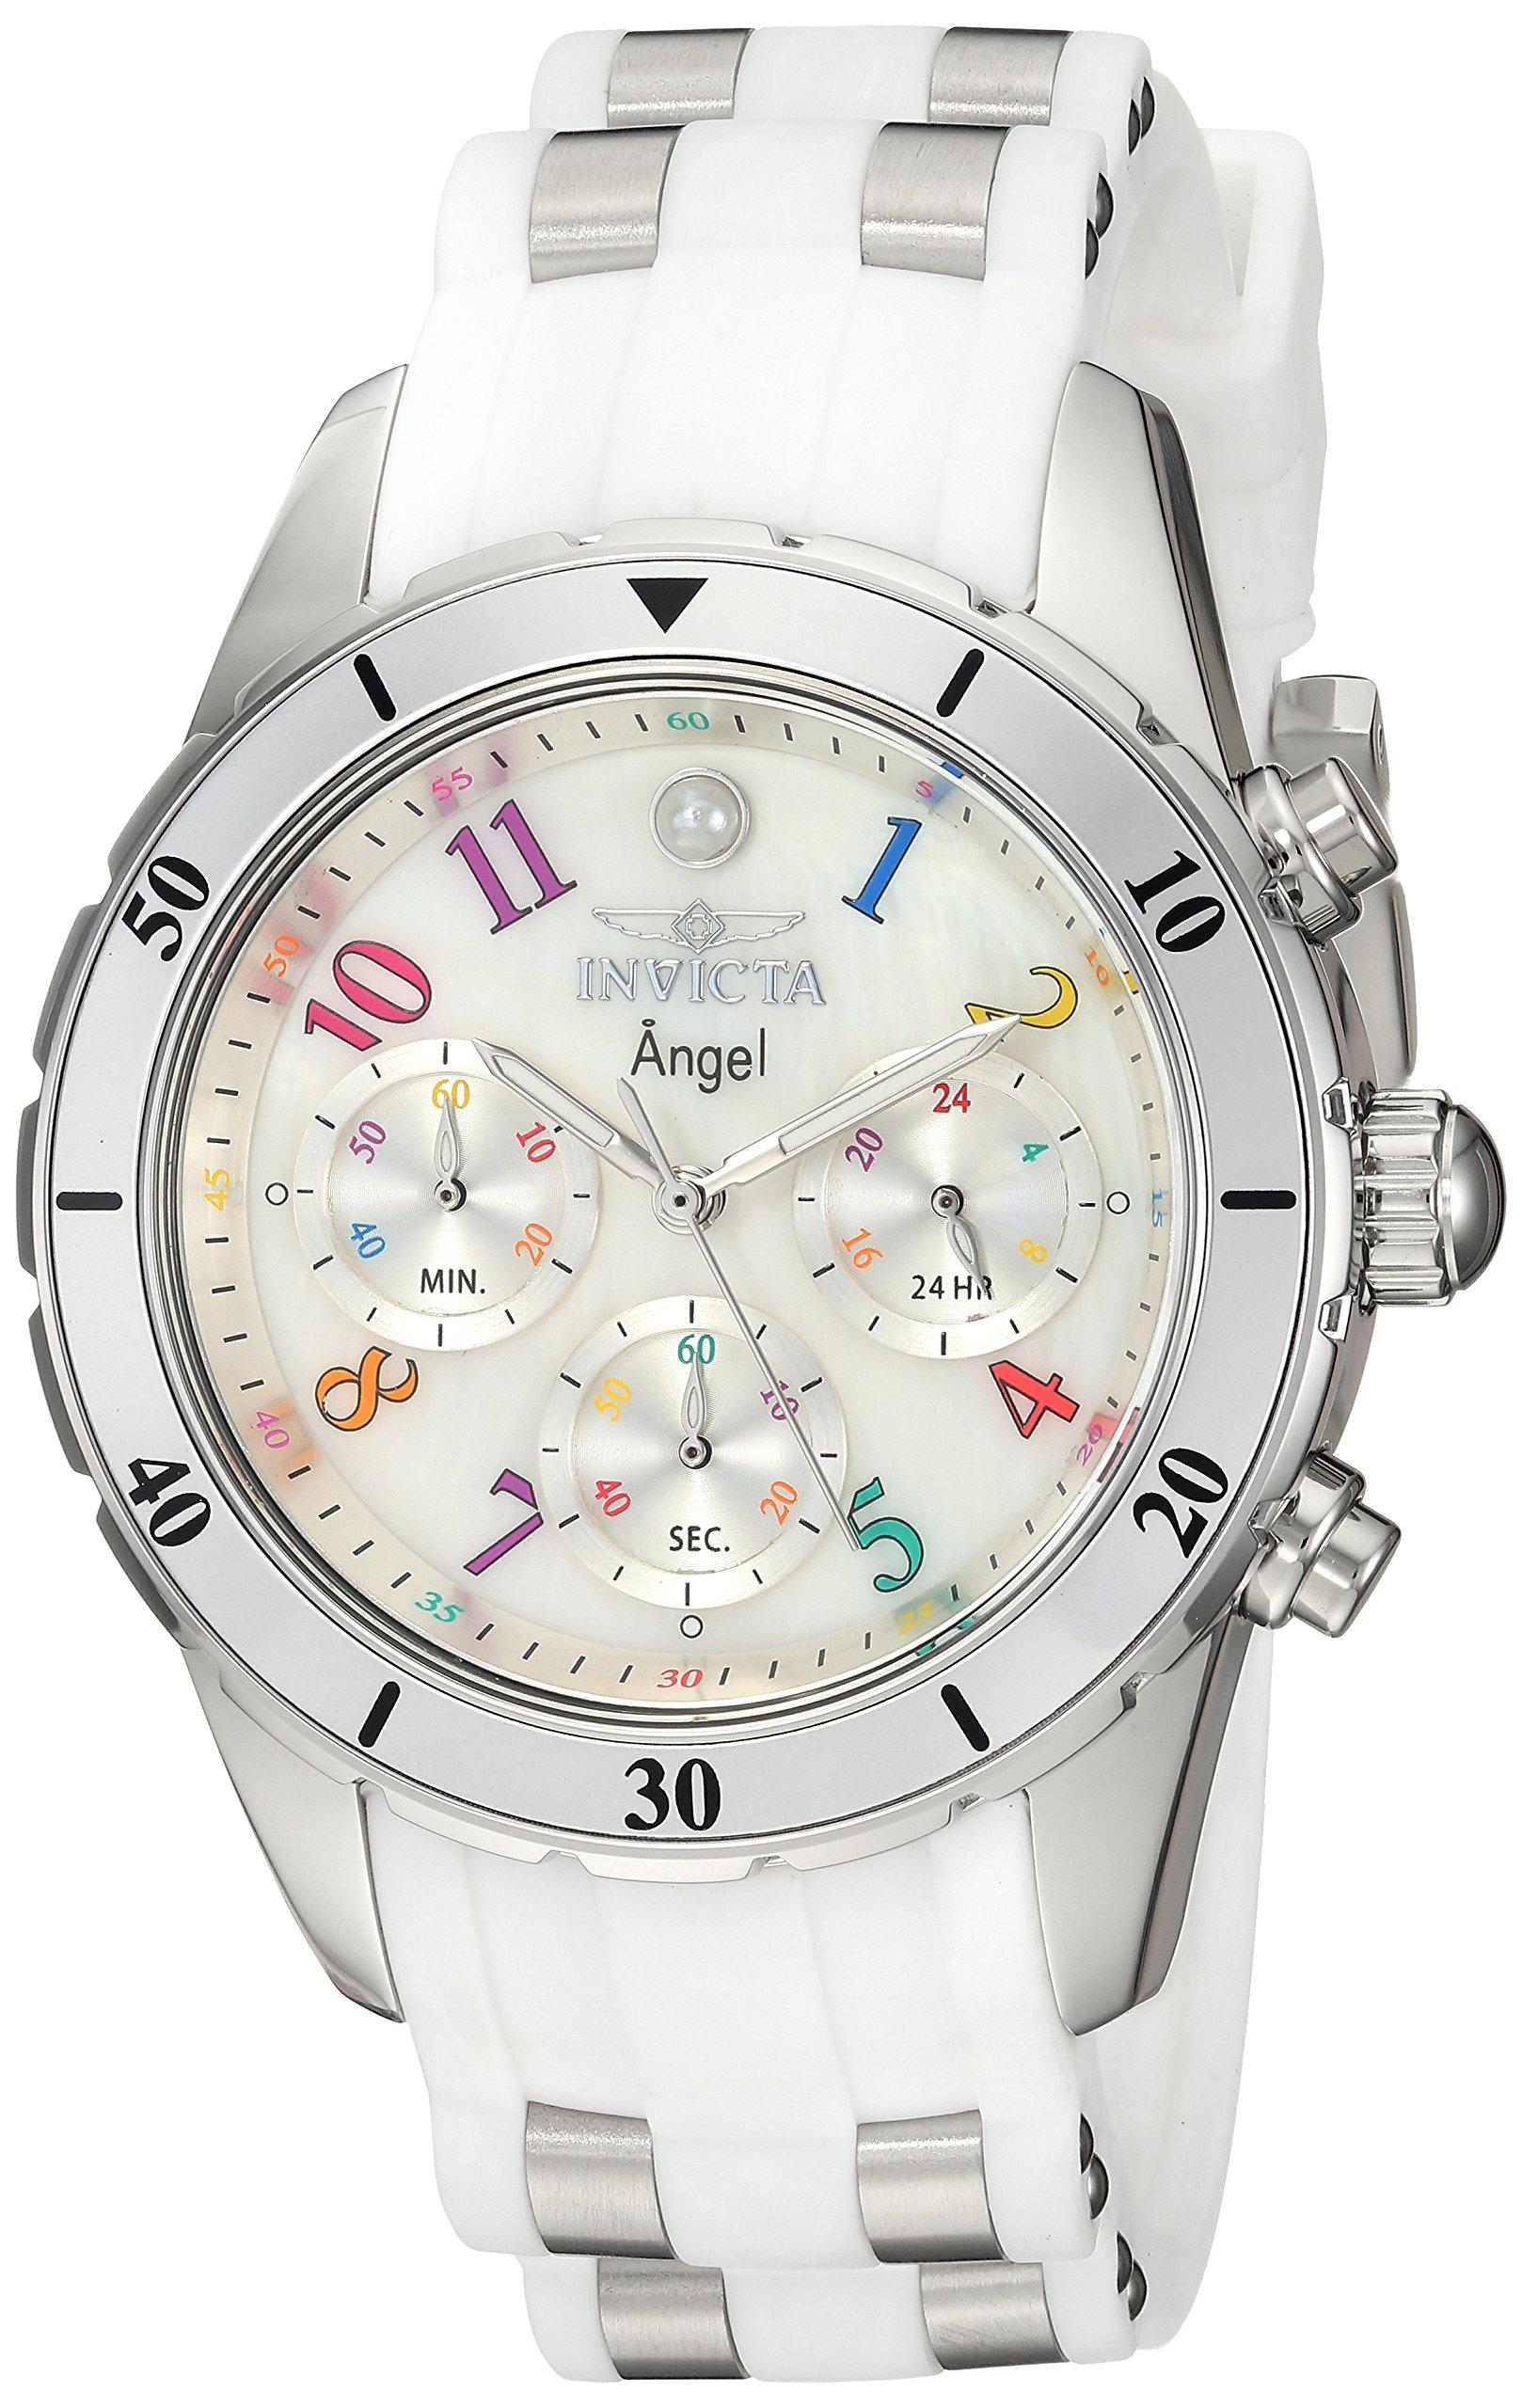 ویکالا · خرید  اصل اورجینال · خرید از آمازون · Invicta Women's Angel Stainless Steel Quartz Watch with Silicone Strap, White, 20 (Model: 24903) wekala · ویکالا